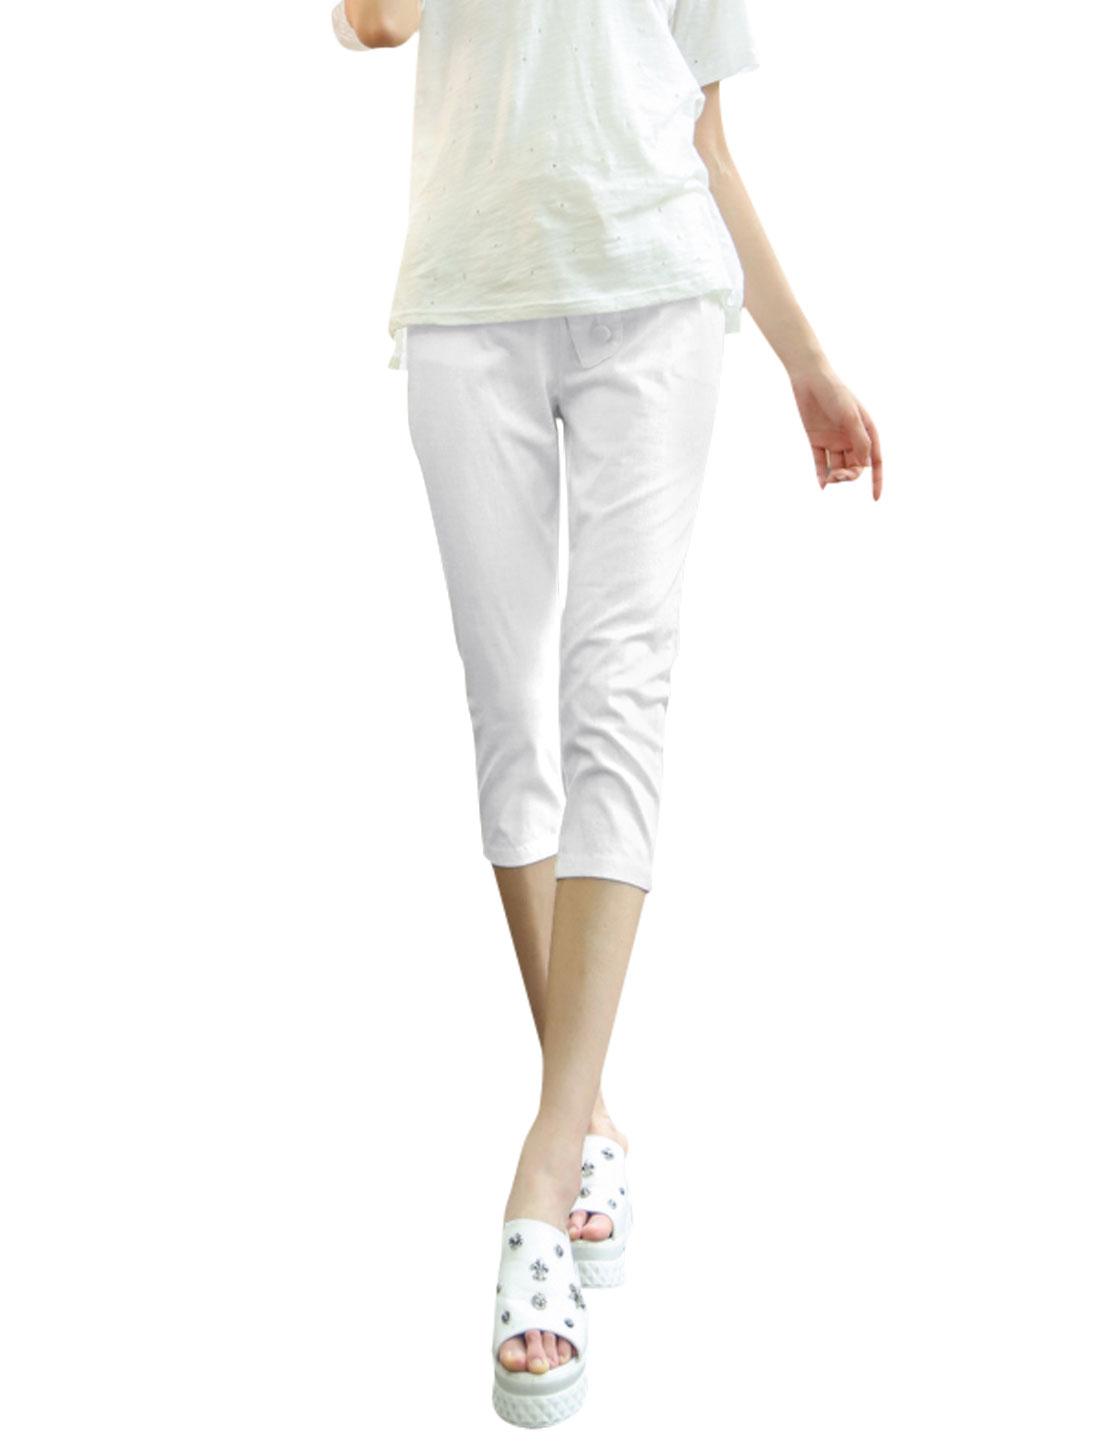 Lady Drawstring Elastic Waist Mock Placket Casual Linen Capris White M